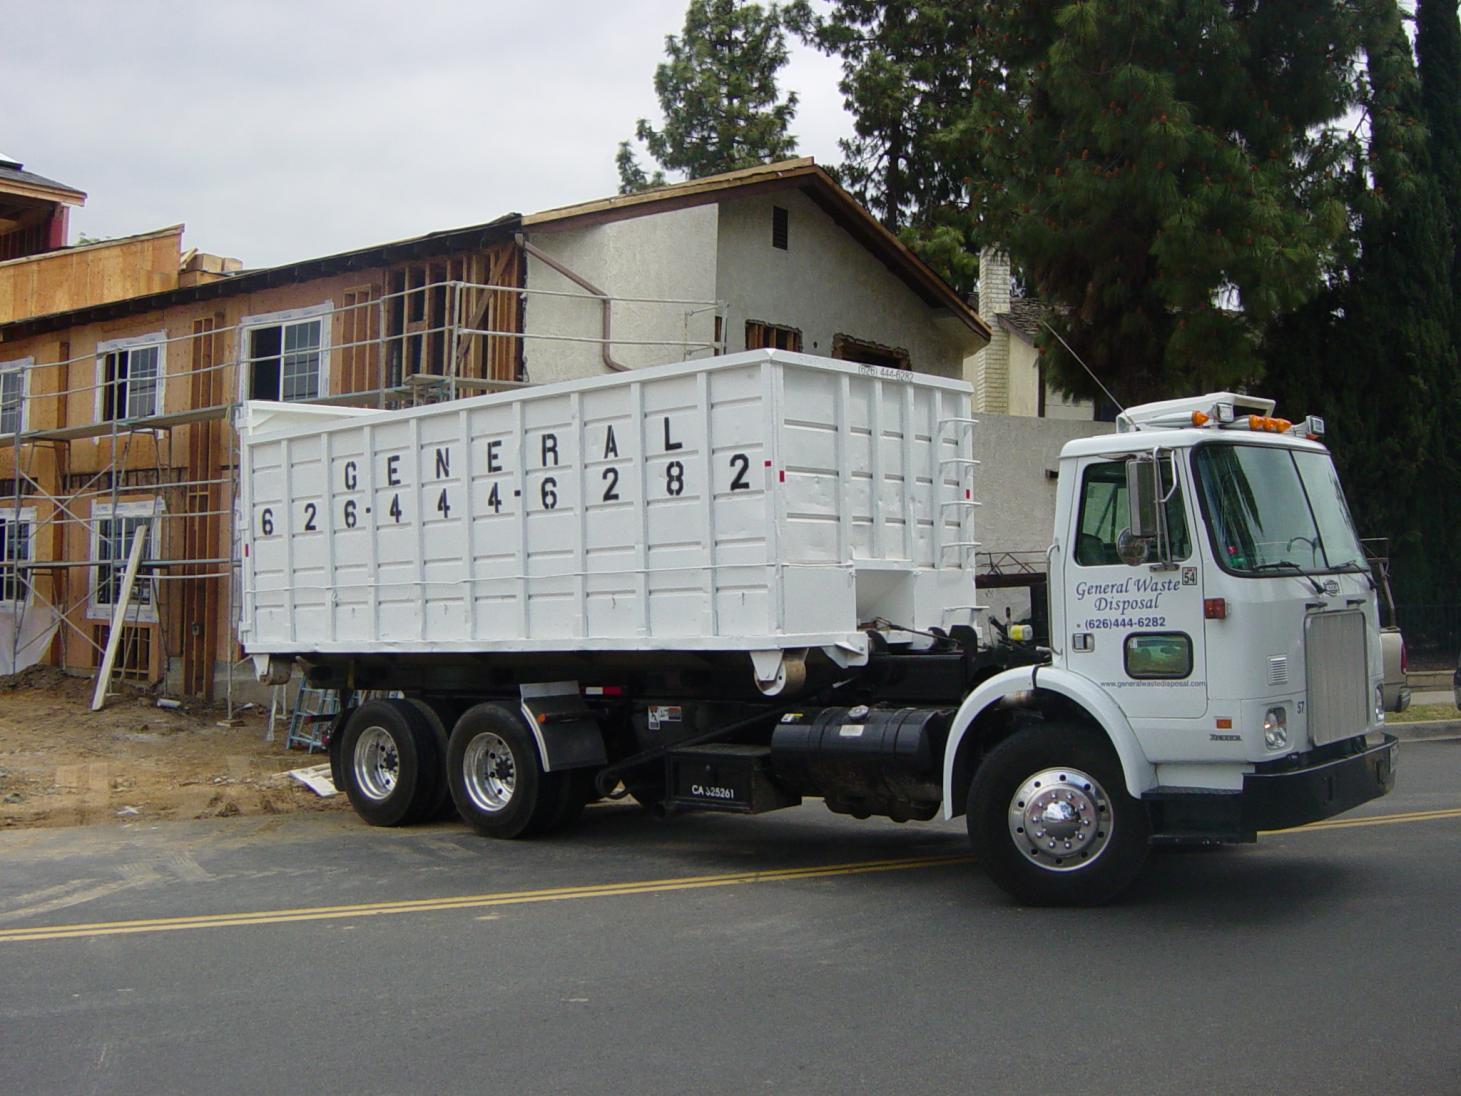 Post your work truck/van thread-40yd-roll-off.jpg